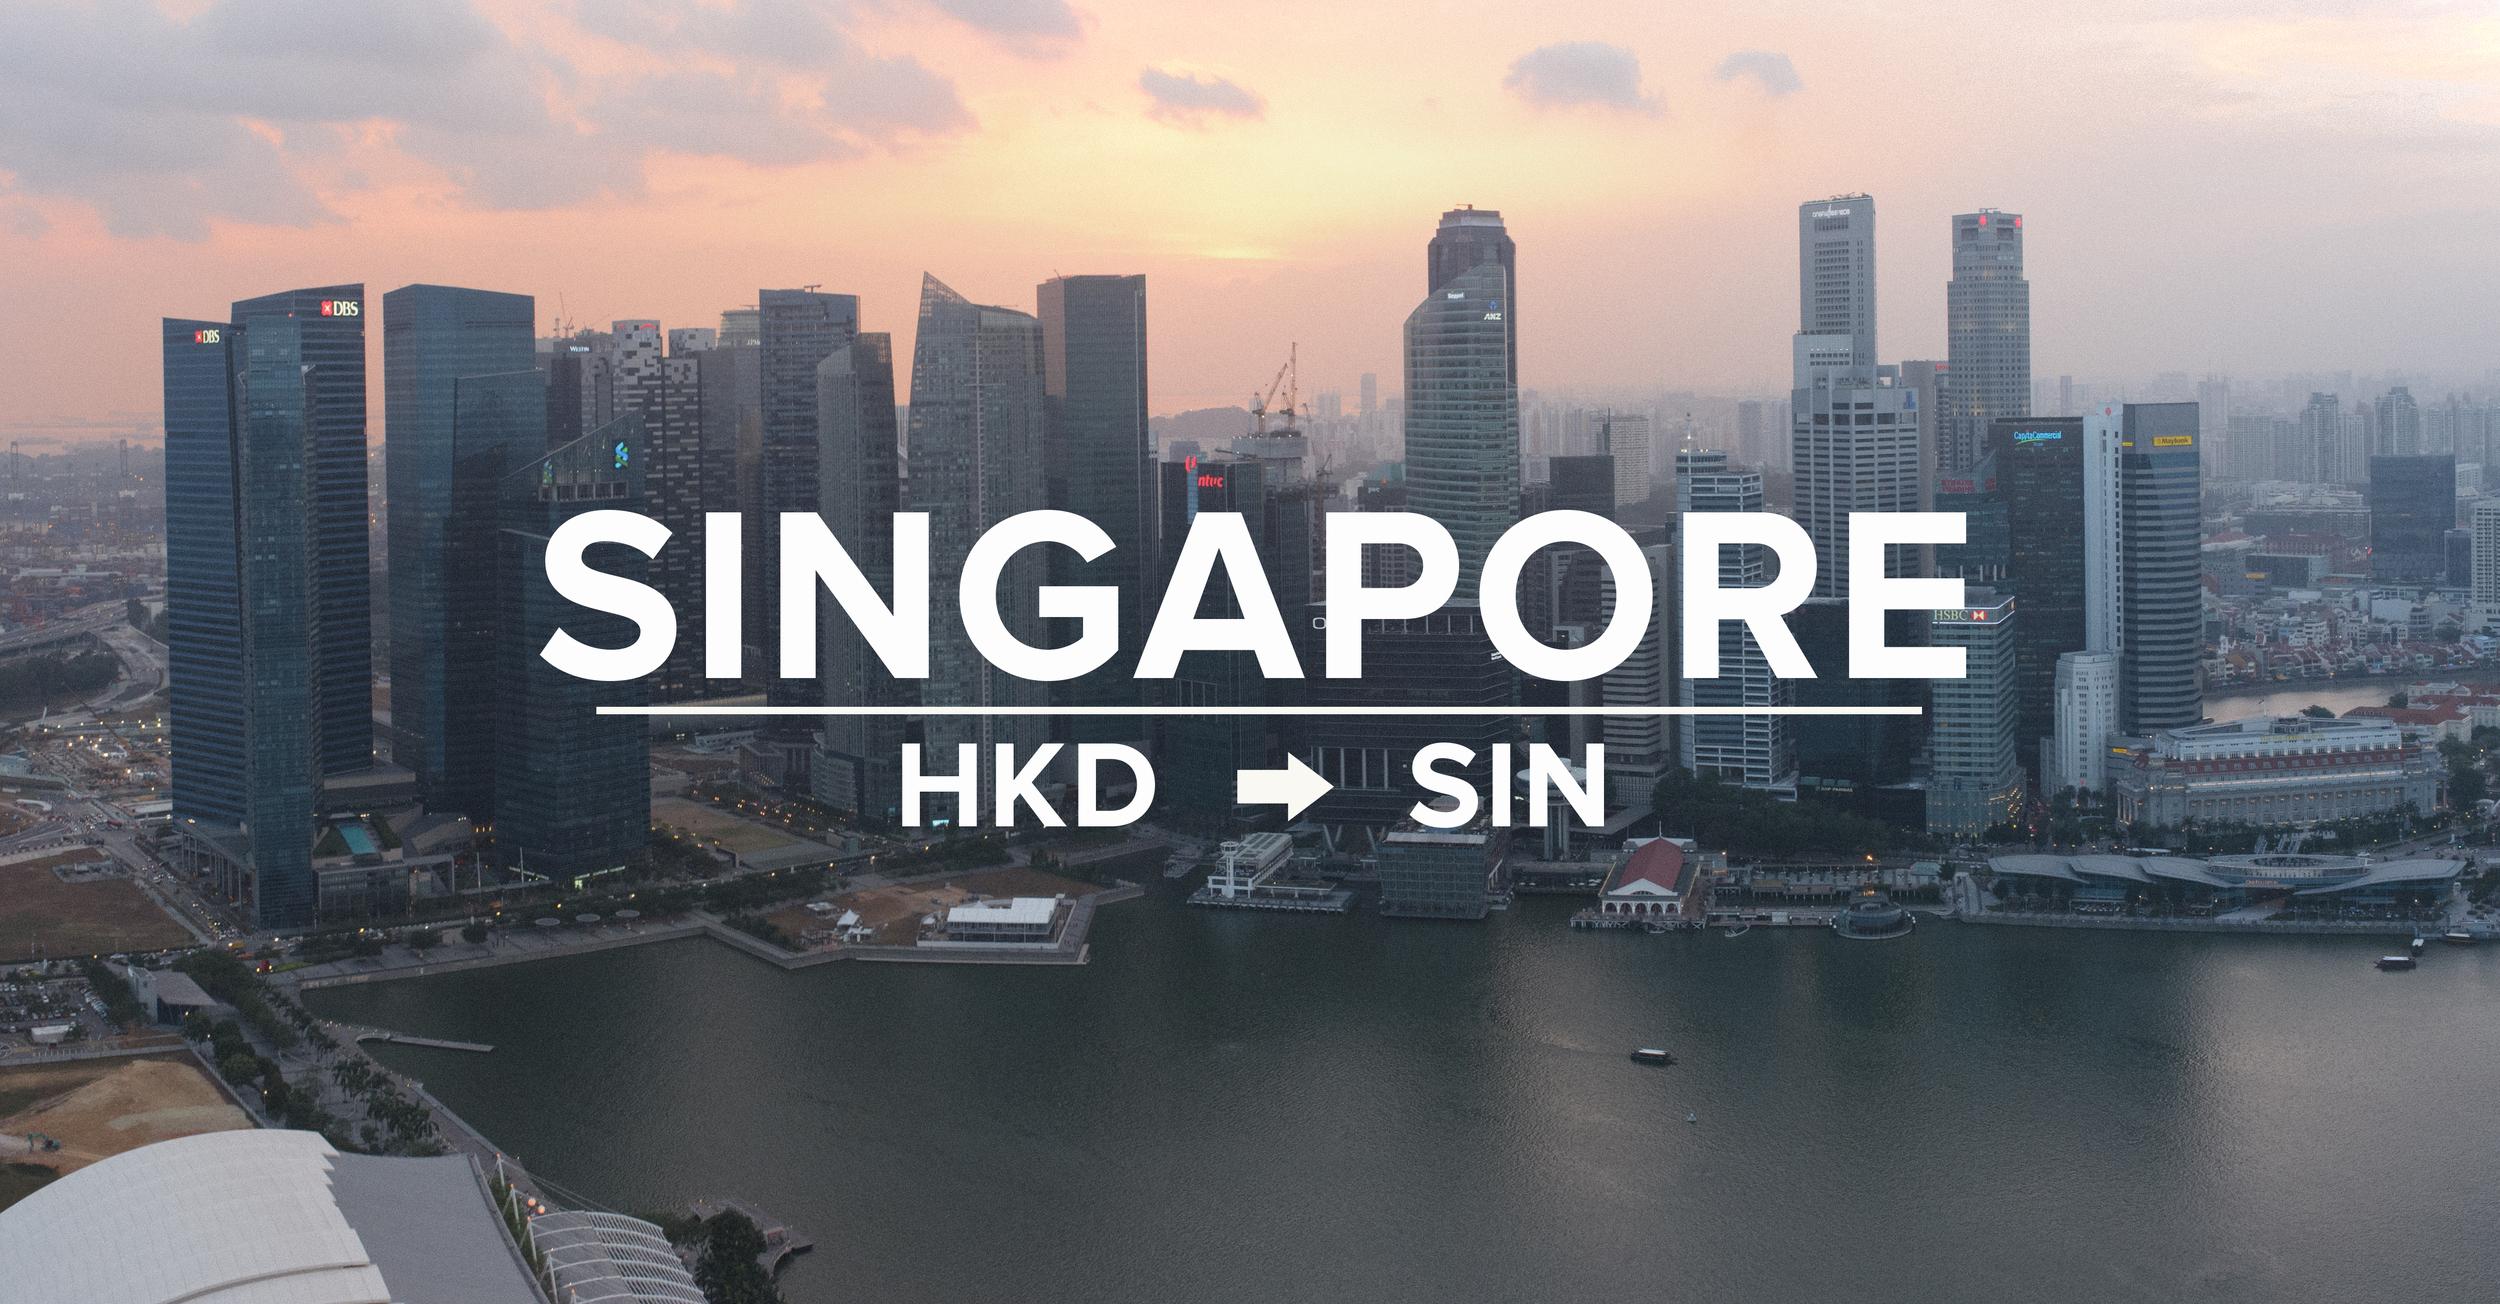 SingaporeOverview.jpg